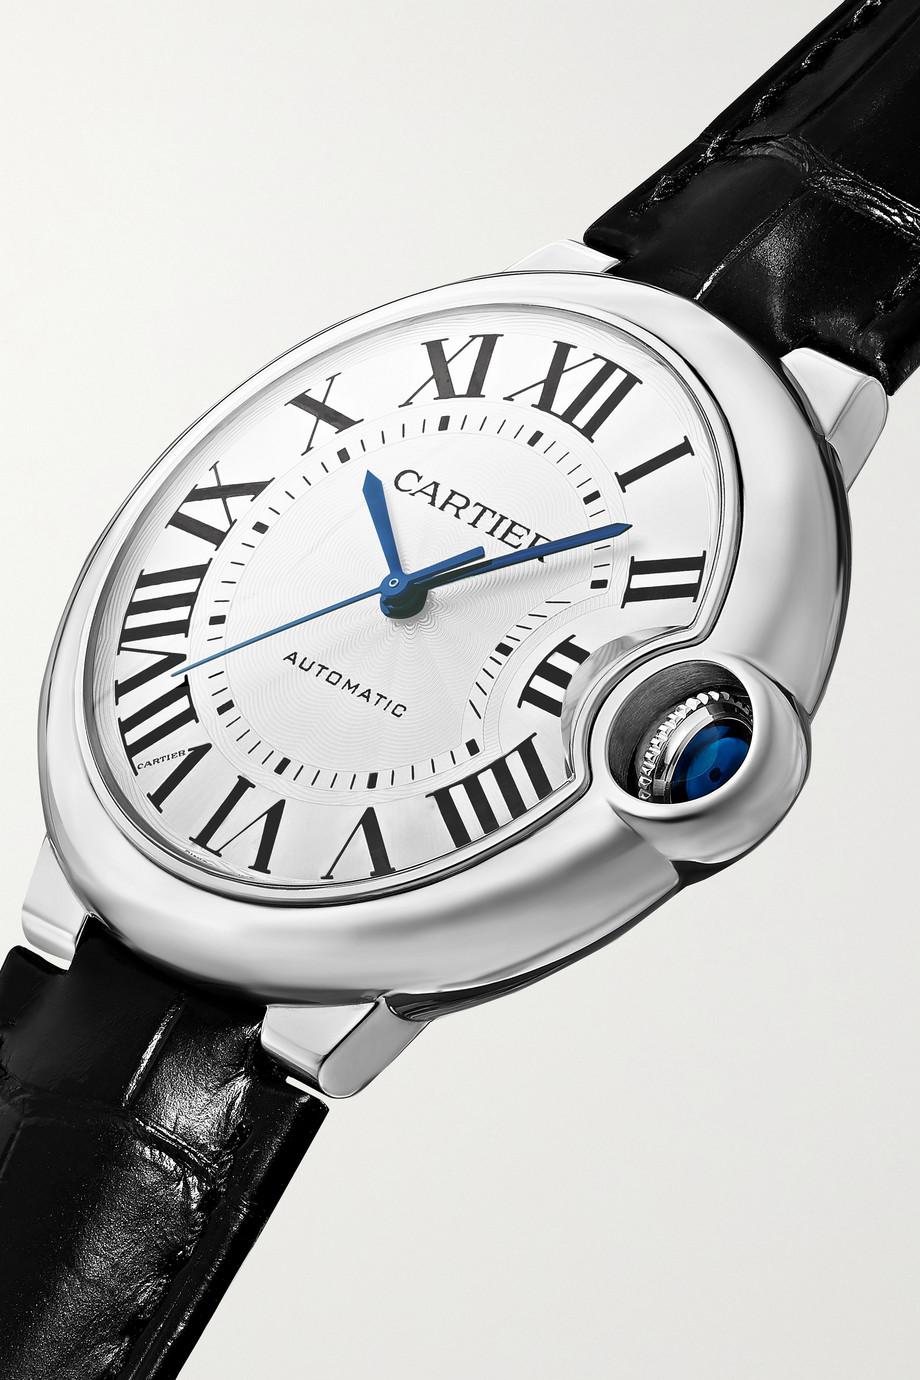 Cartier Ballon Bleu de Cartier Automatic 36 毫米精钢腕表(短吻鳄鱼皮表带)